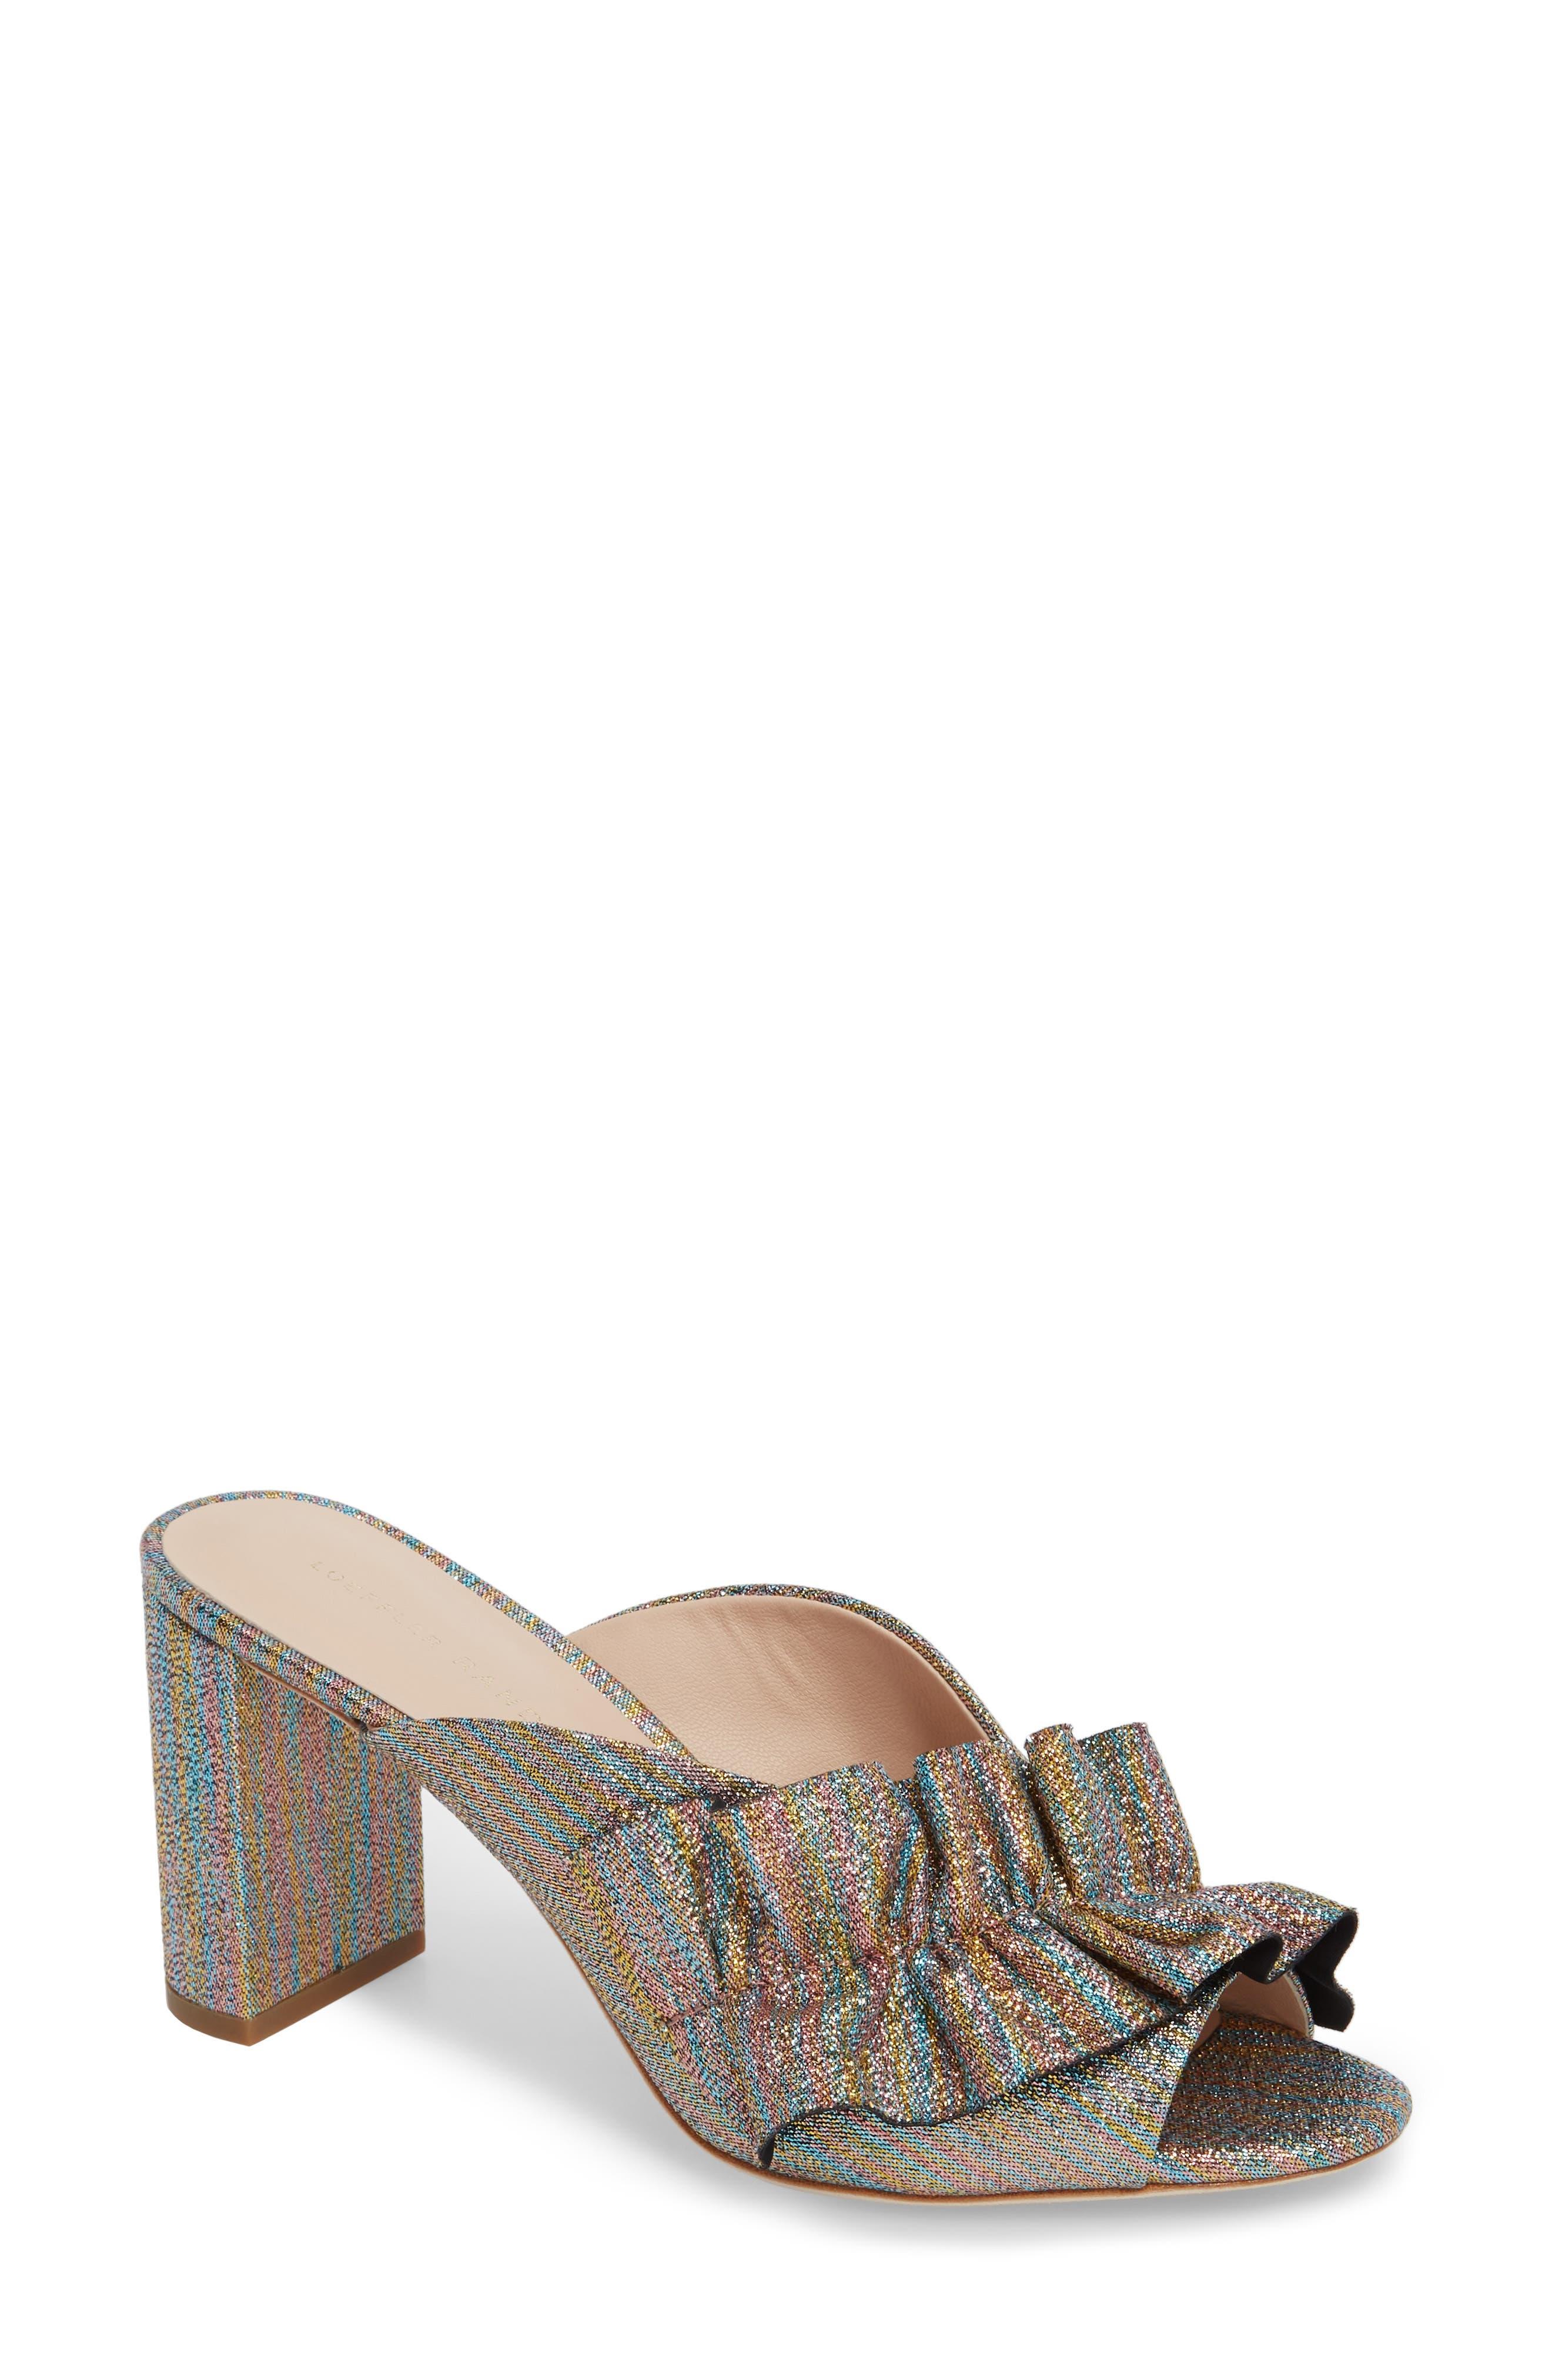 Loeffler Randall Esme Ruffled Mule Sandal (Women)